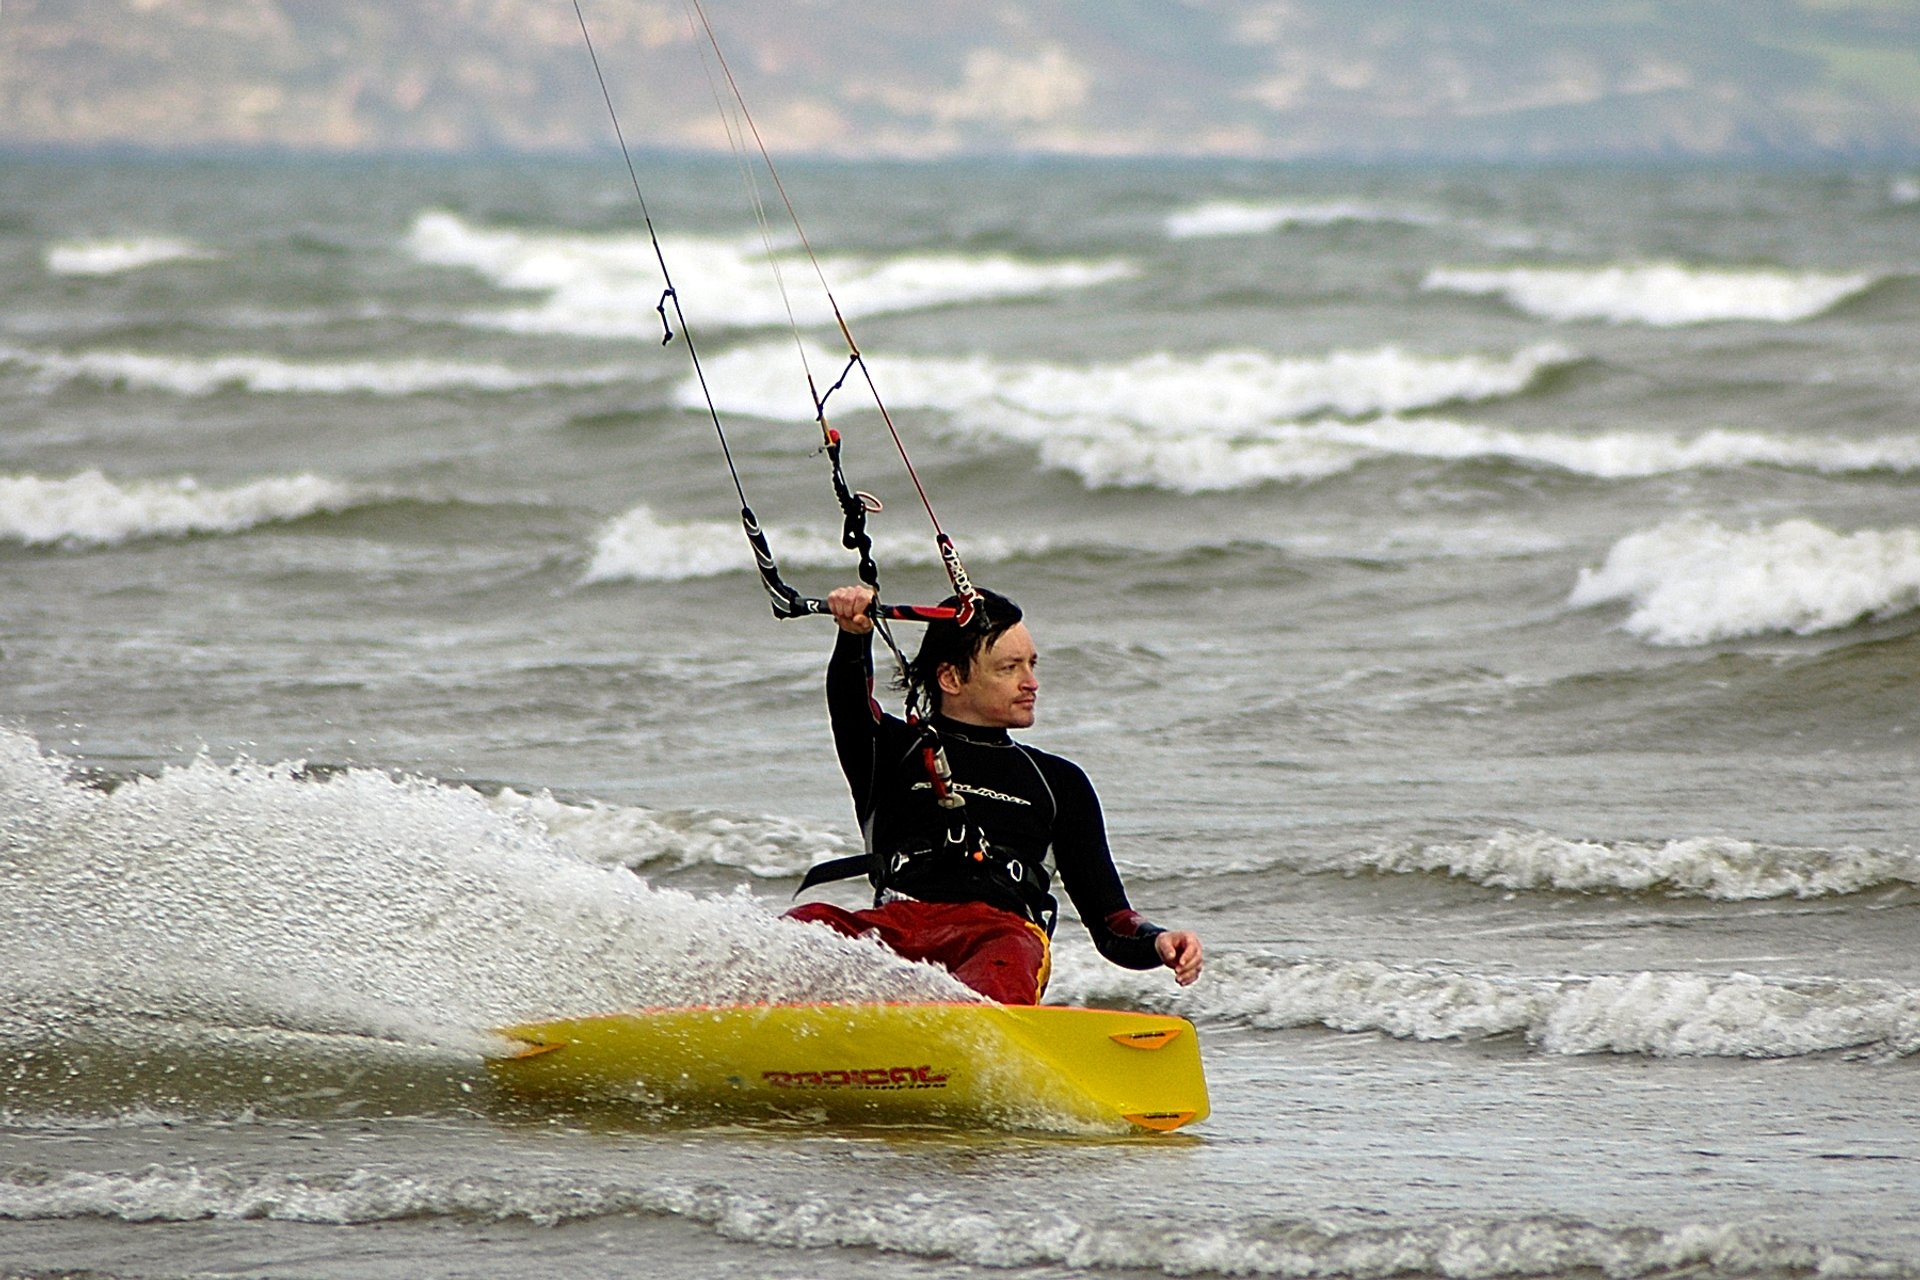 Kitesurfing & Windsurfing in Ireland 2020 - Best Time